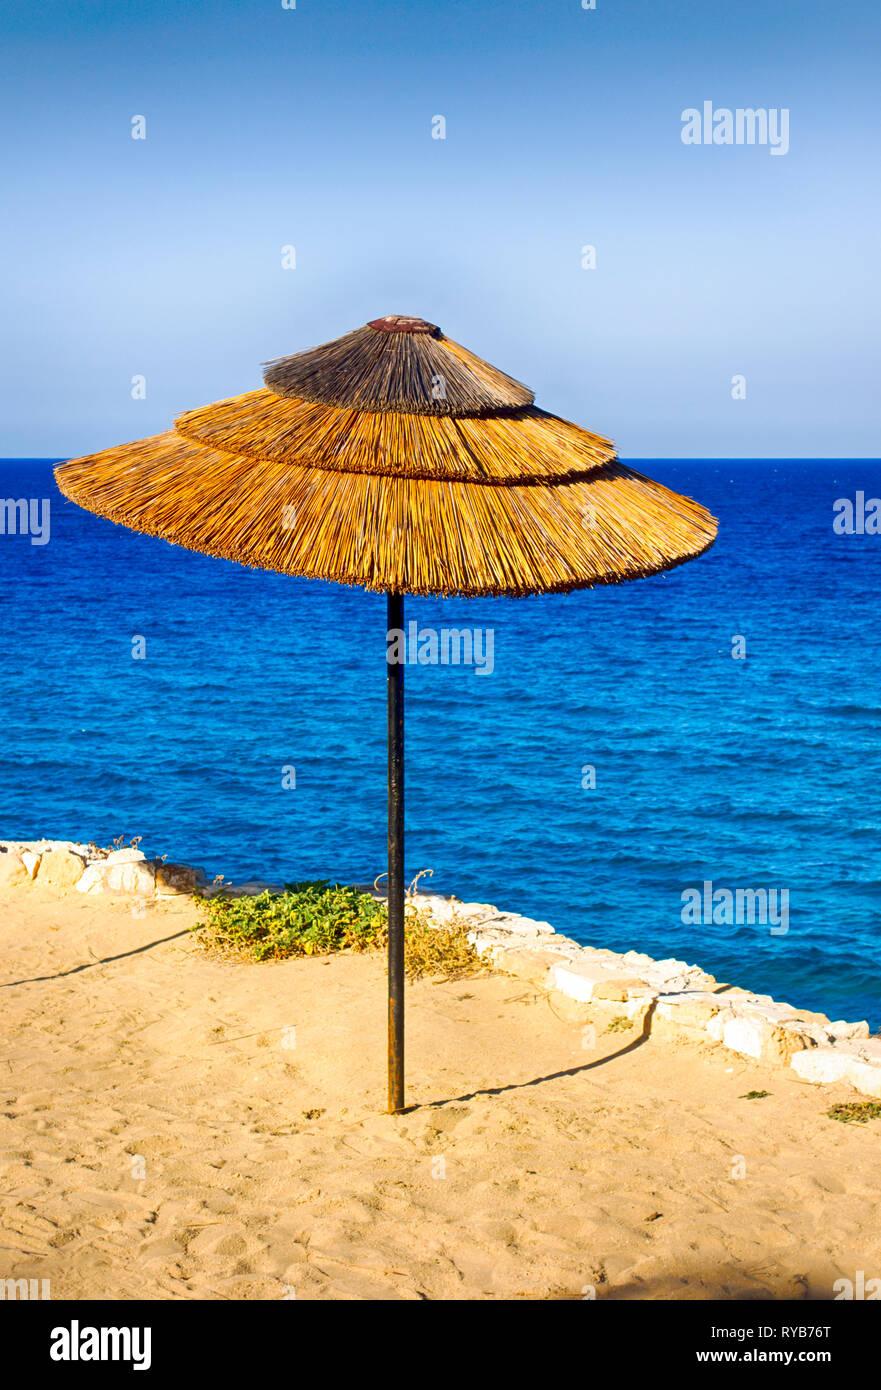 Straw beach umbrella on the sea beach. - Stock Image